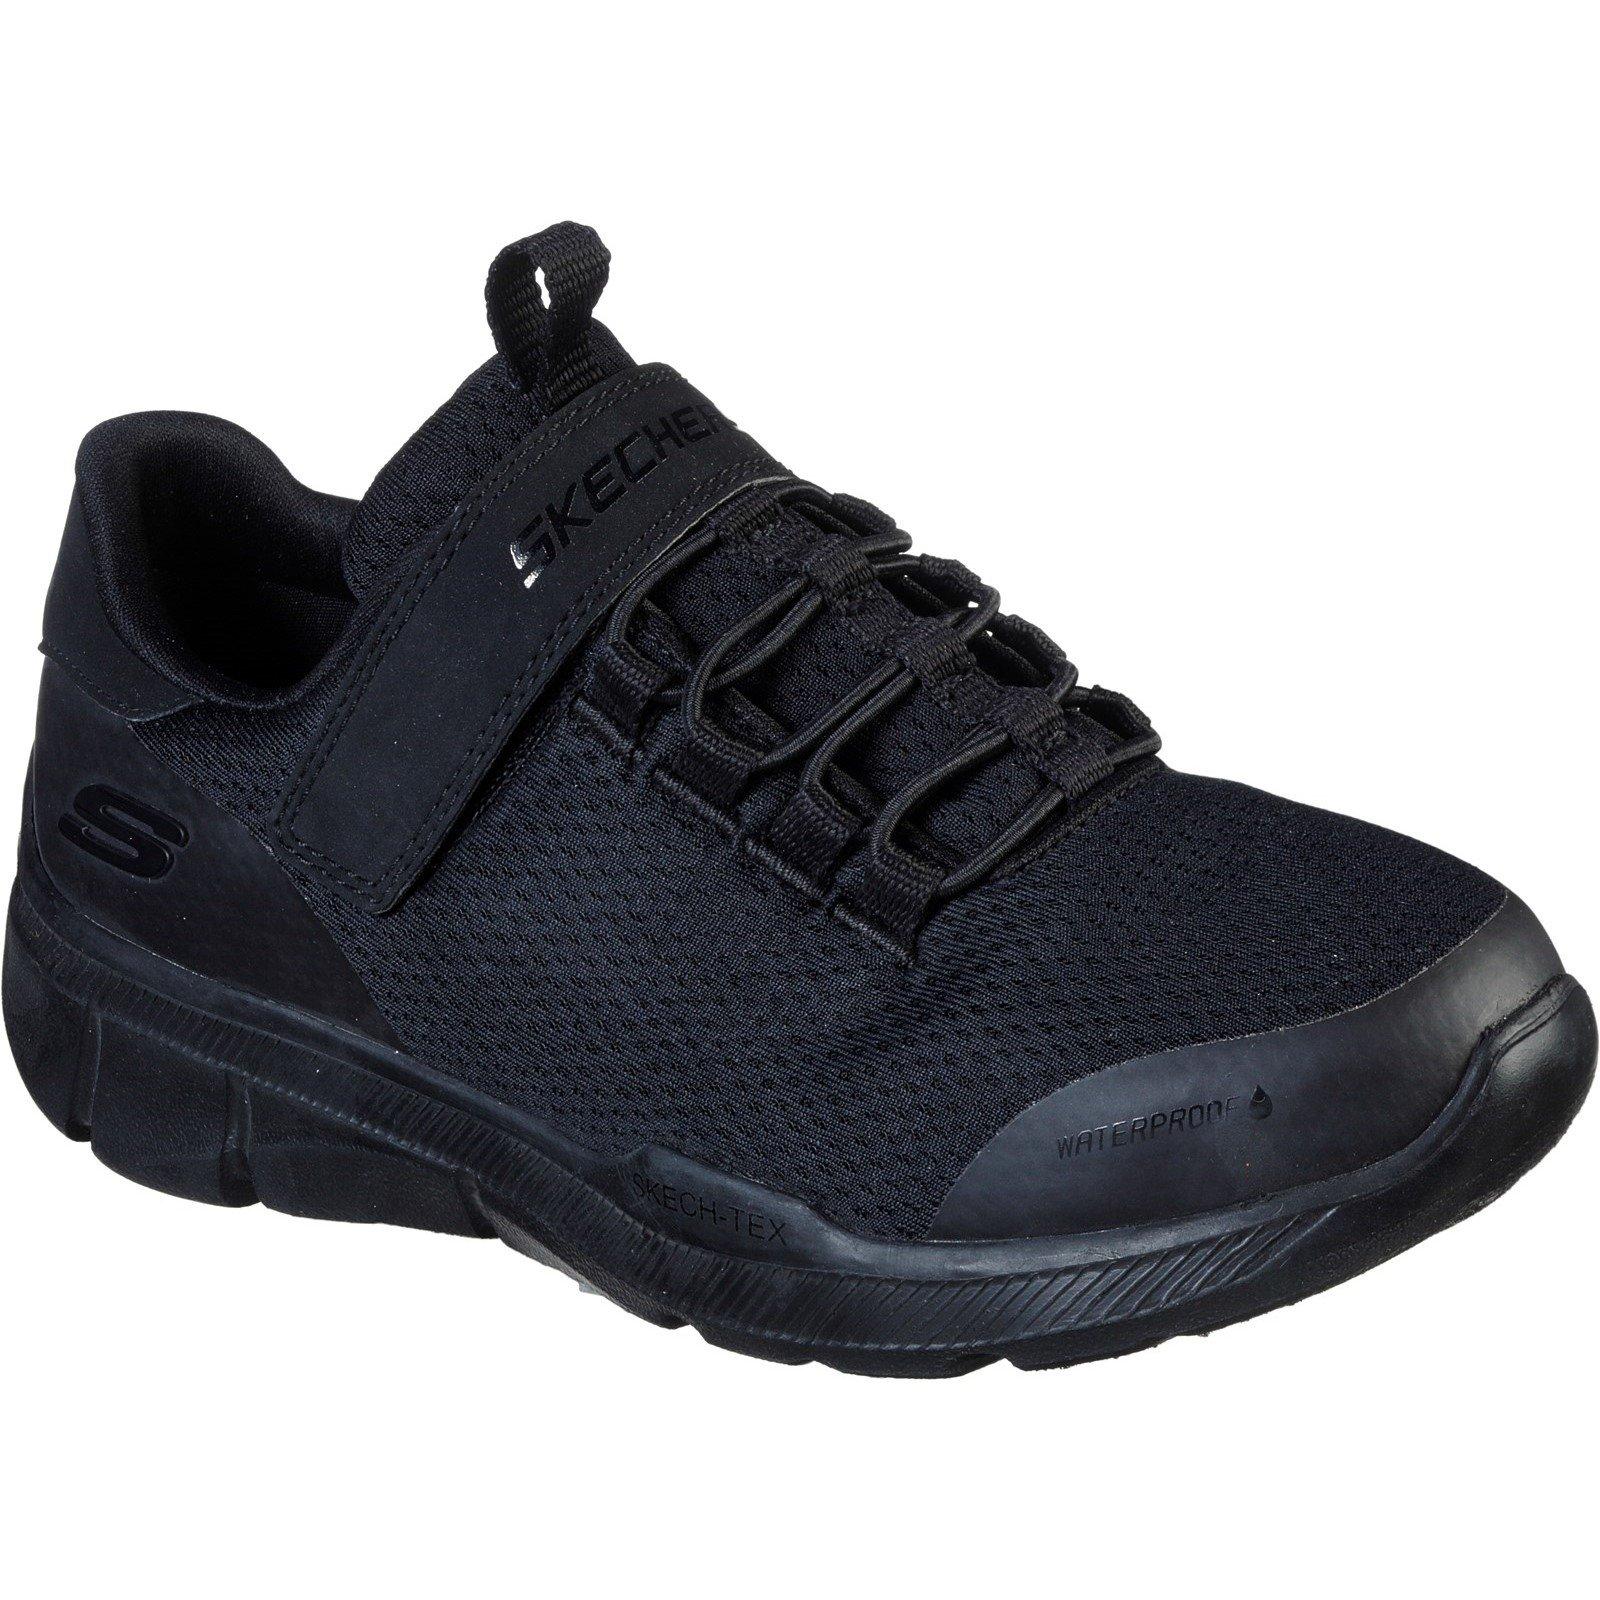 Skechers Unisex Equalizer 3.0 Aquablast Trainer Black 28533 - Black 10